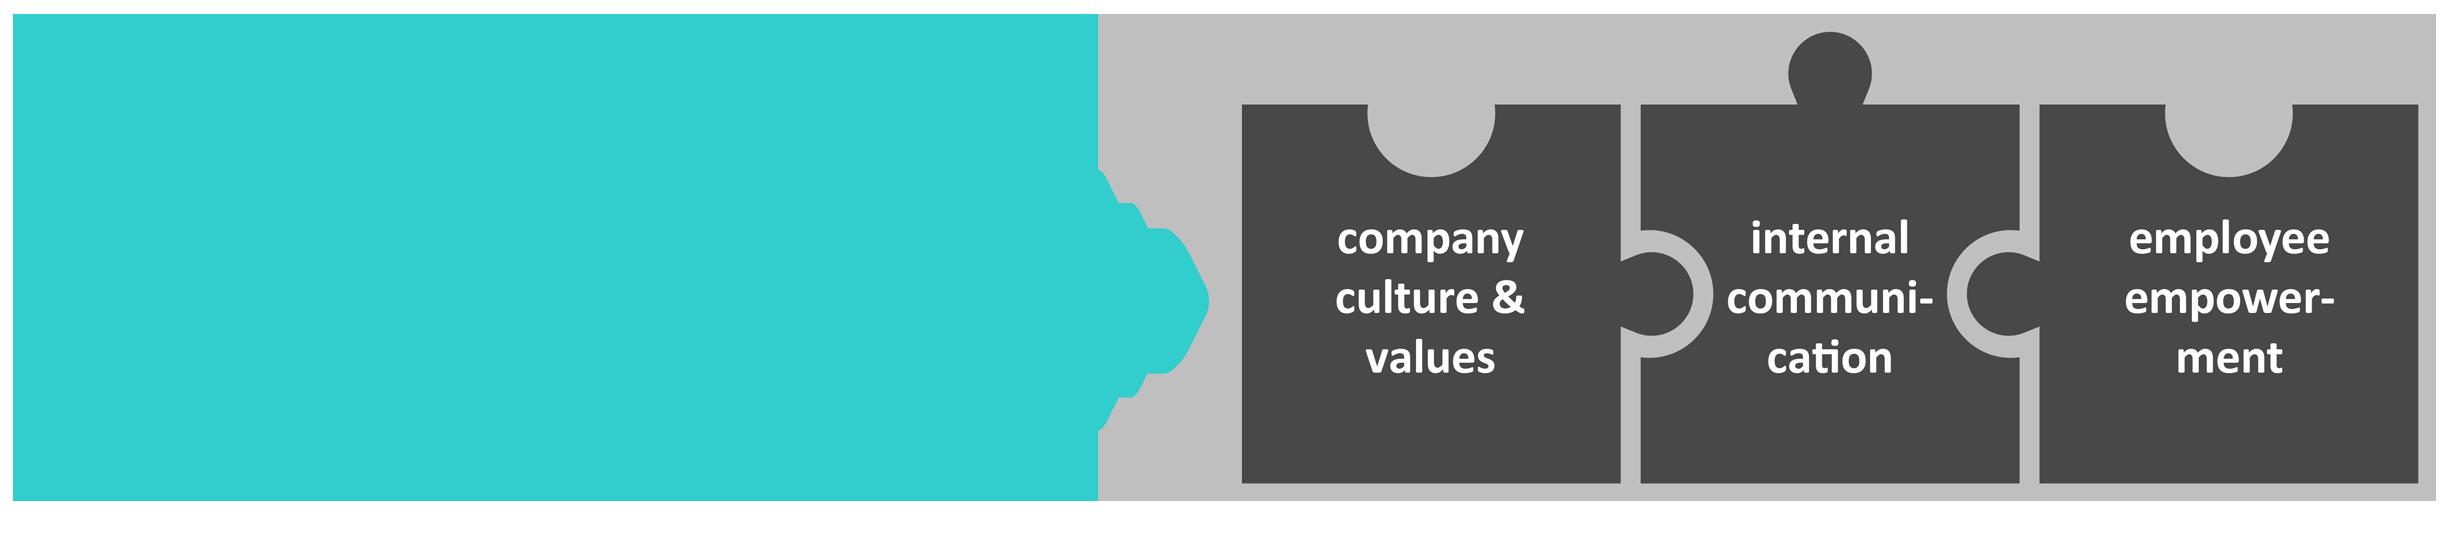 Services-Measures - organisation & culture